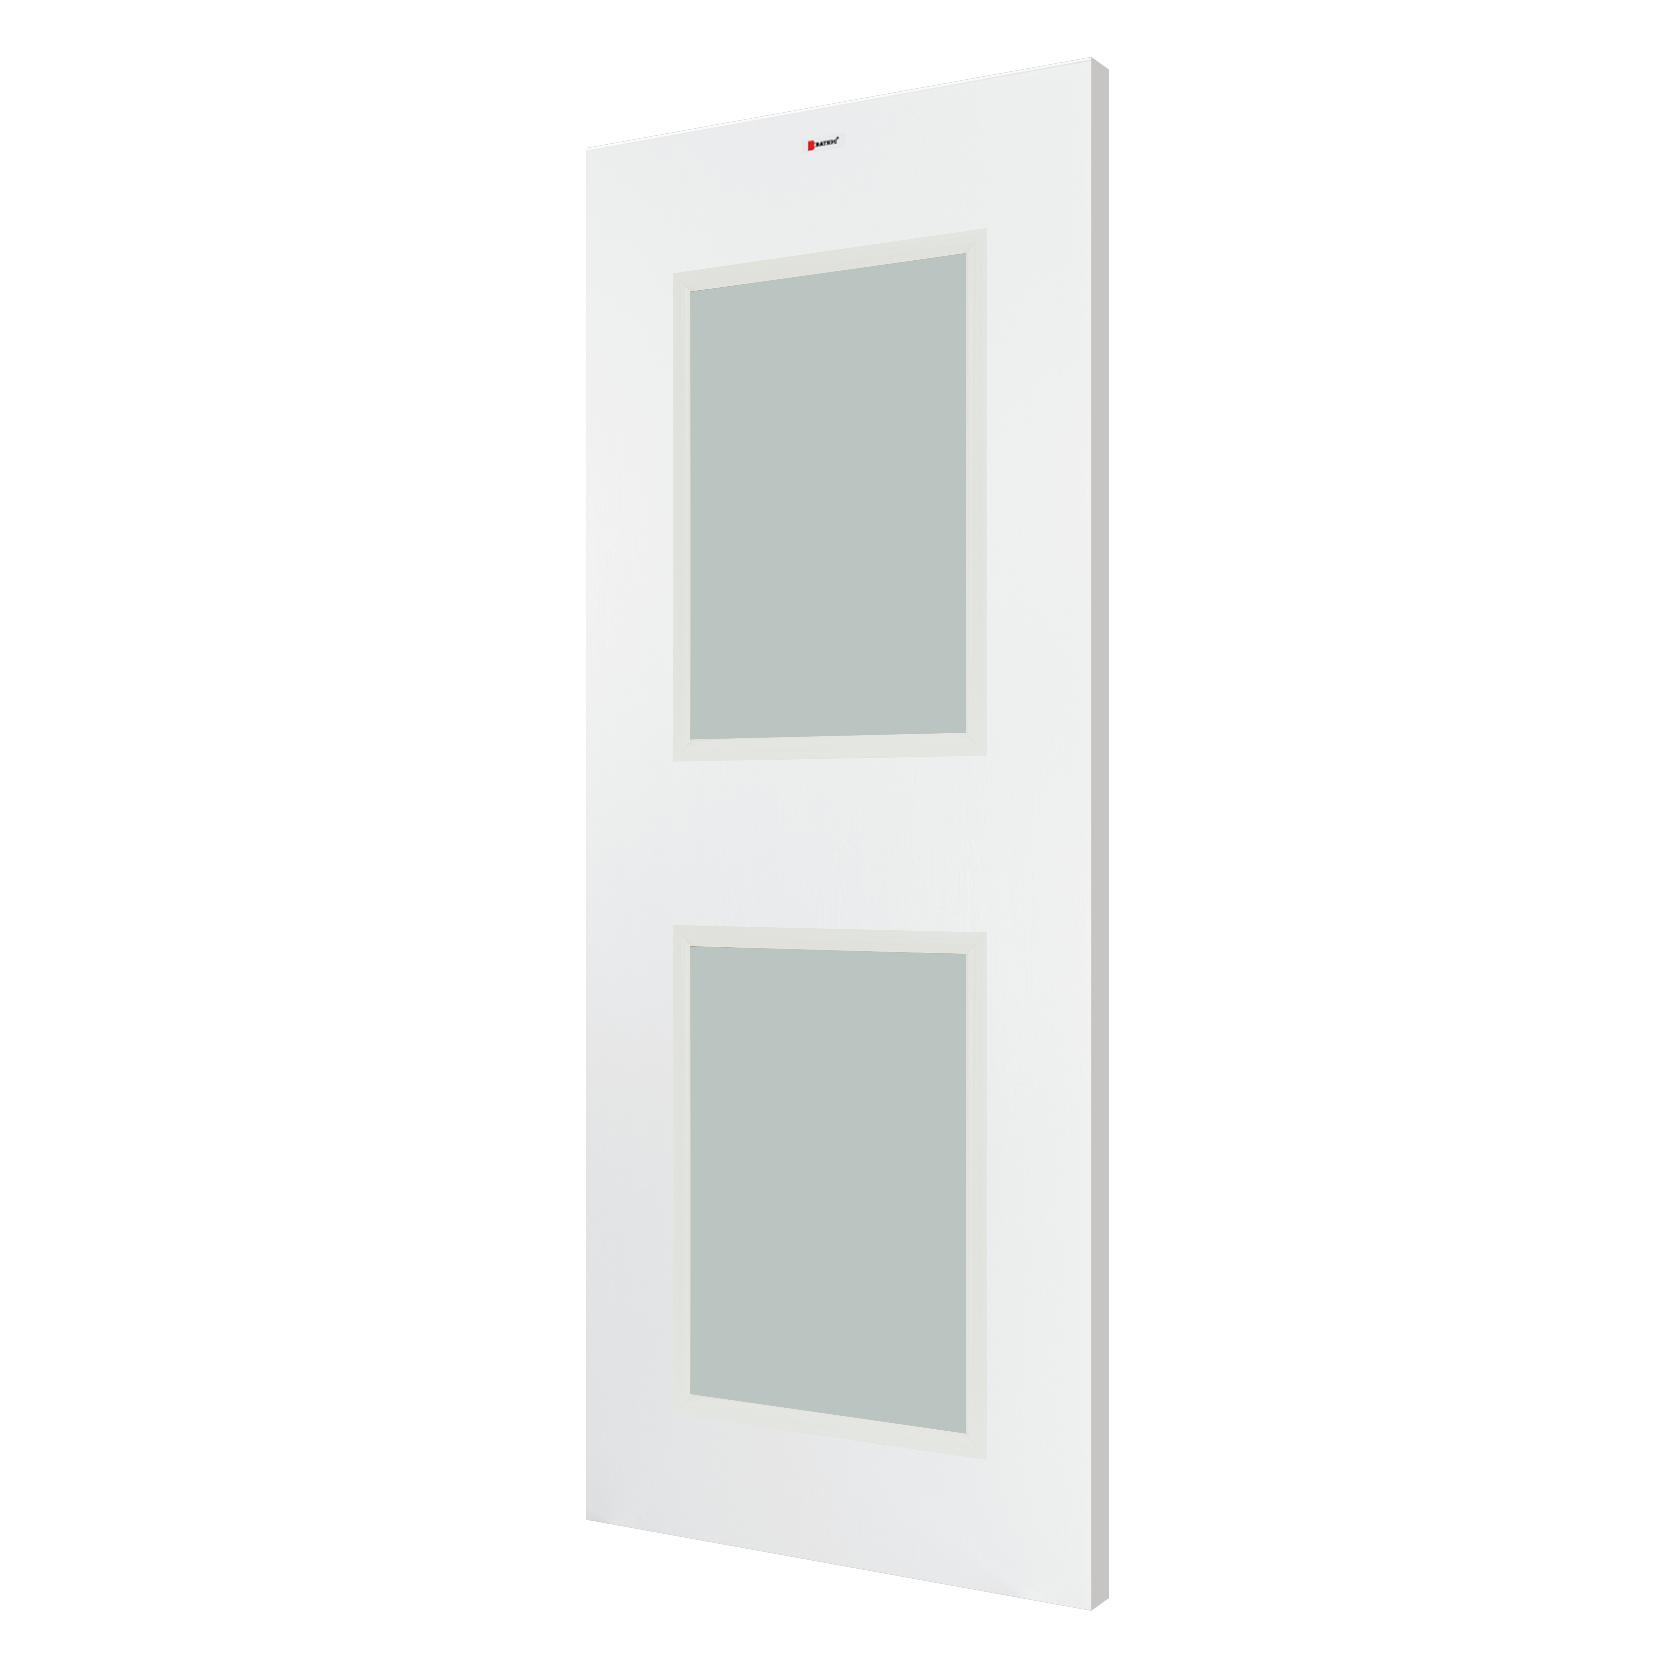 door-wpc-bathic-bwg04-grainwhite-2